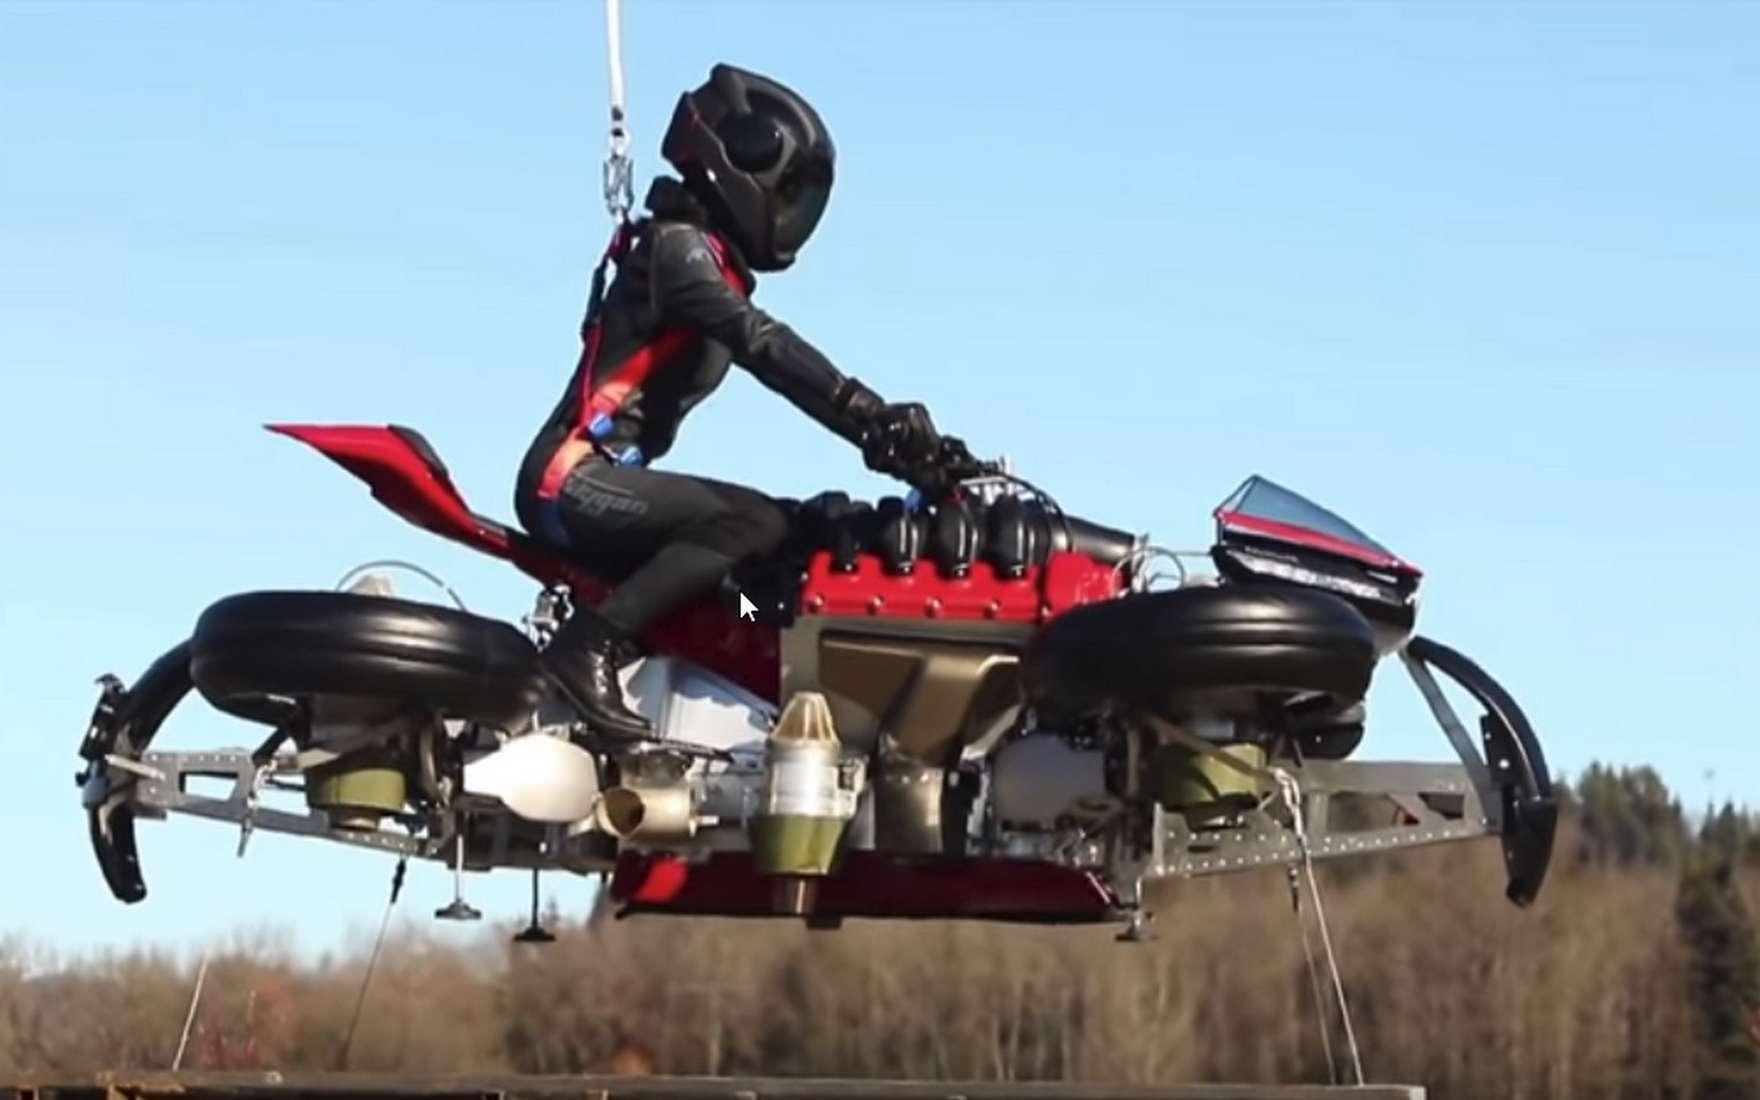 La moto volante Lazareth LMV 496. © Lazareth